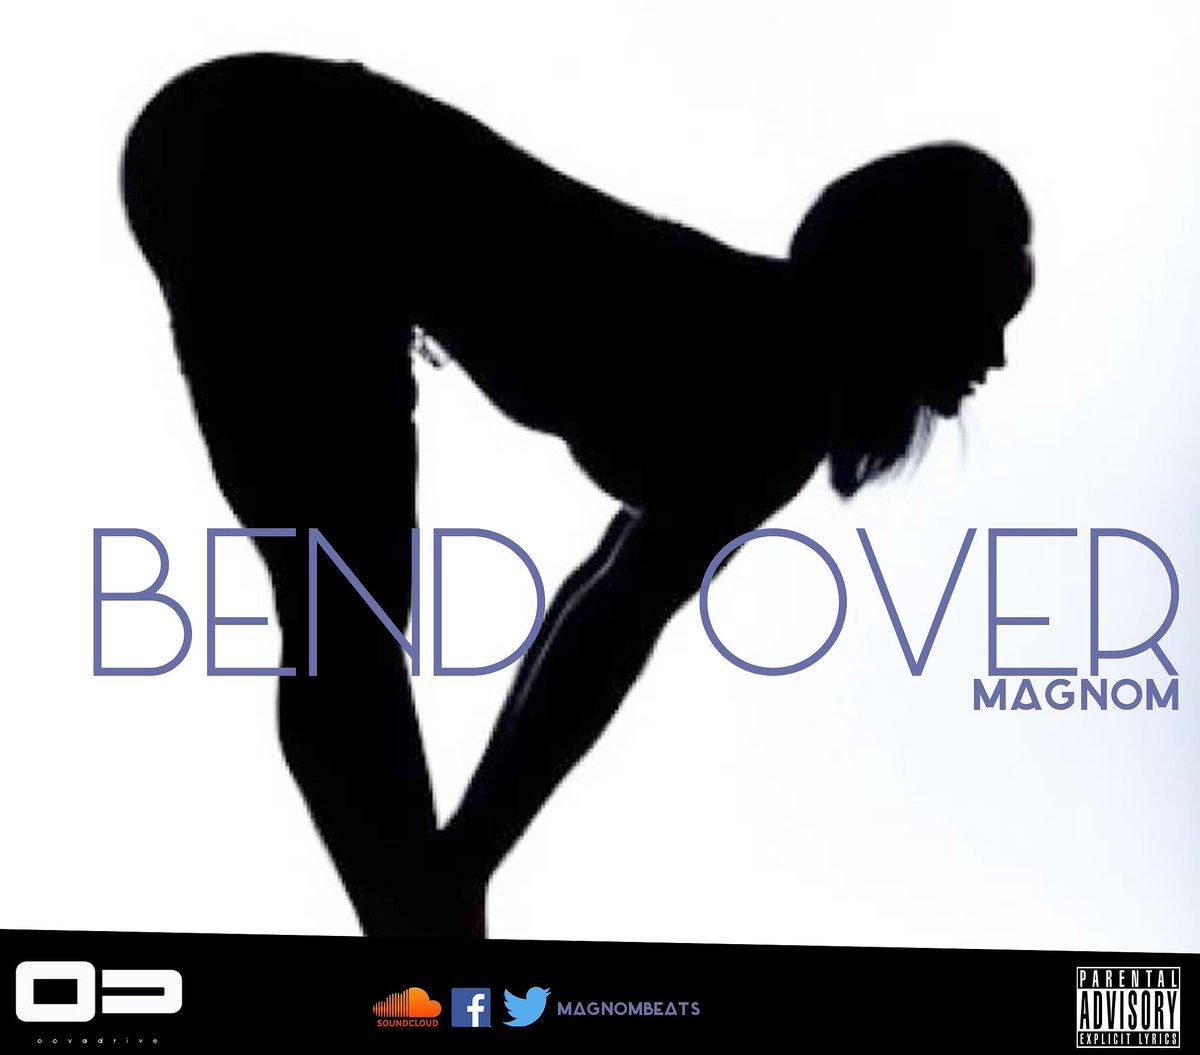 Magnom - Bend Over (Prod By Magnom) https://t.co/qGToxegB2e